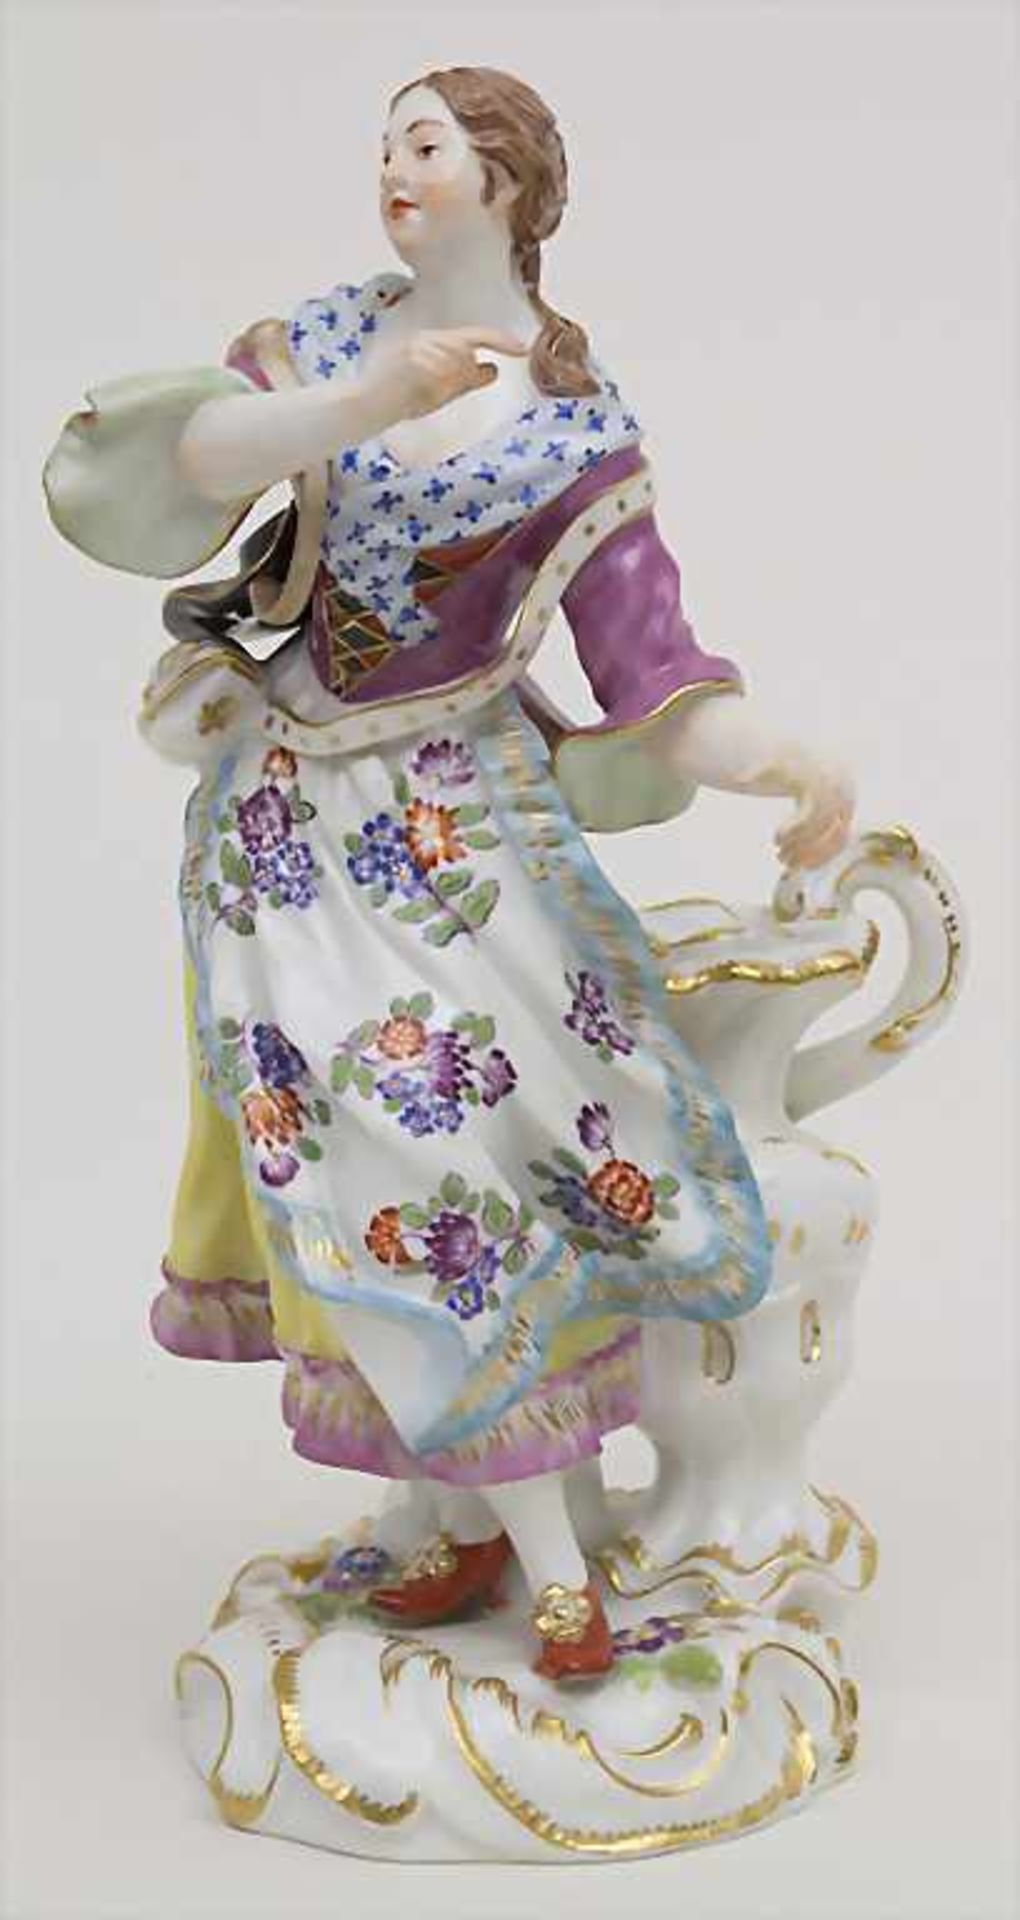 Schäferin mit hohem Henkelgefäß / A figure of a shepherdess with huge jug, Meissen, Mitte 20. Jh.